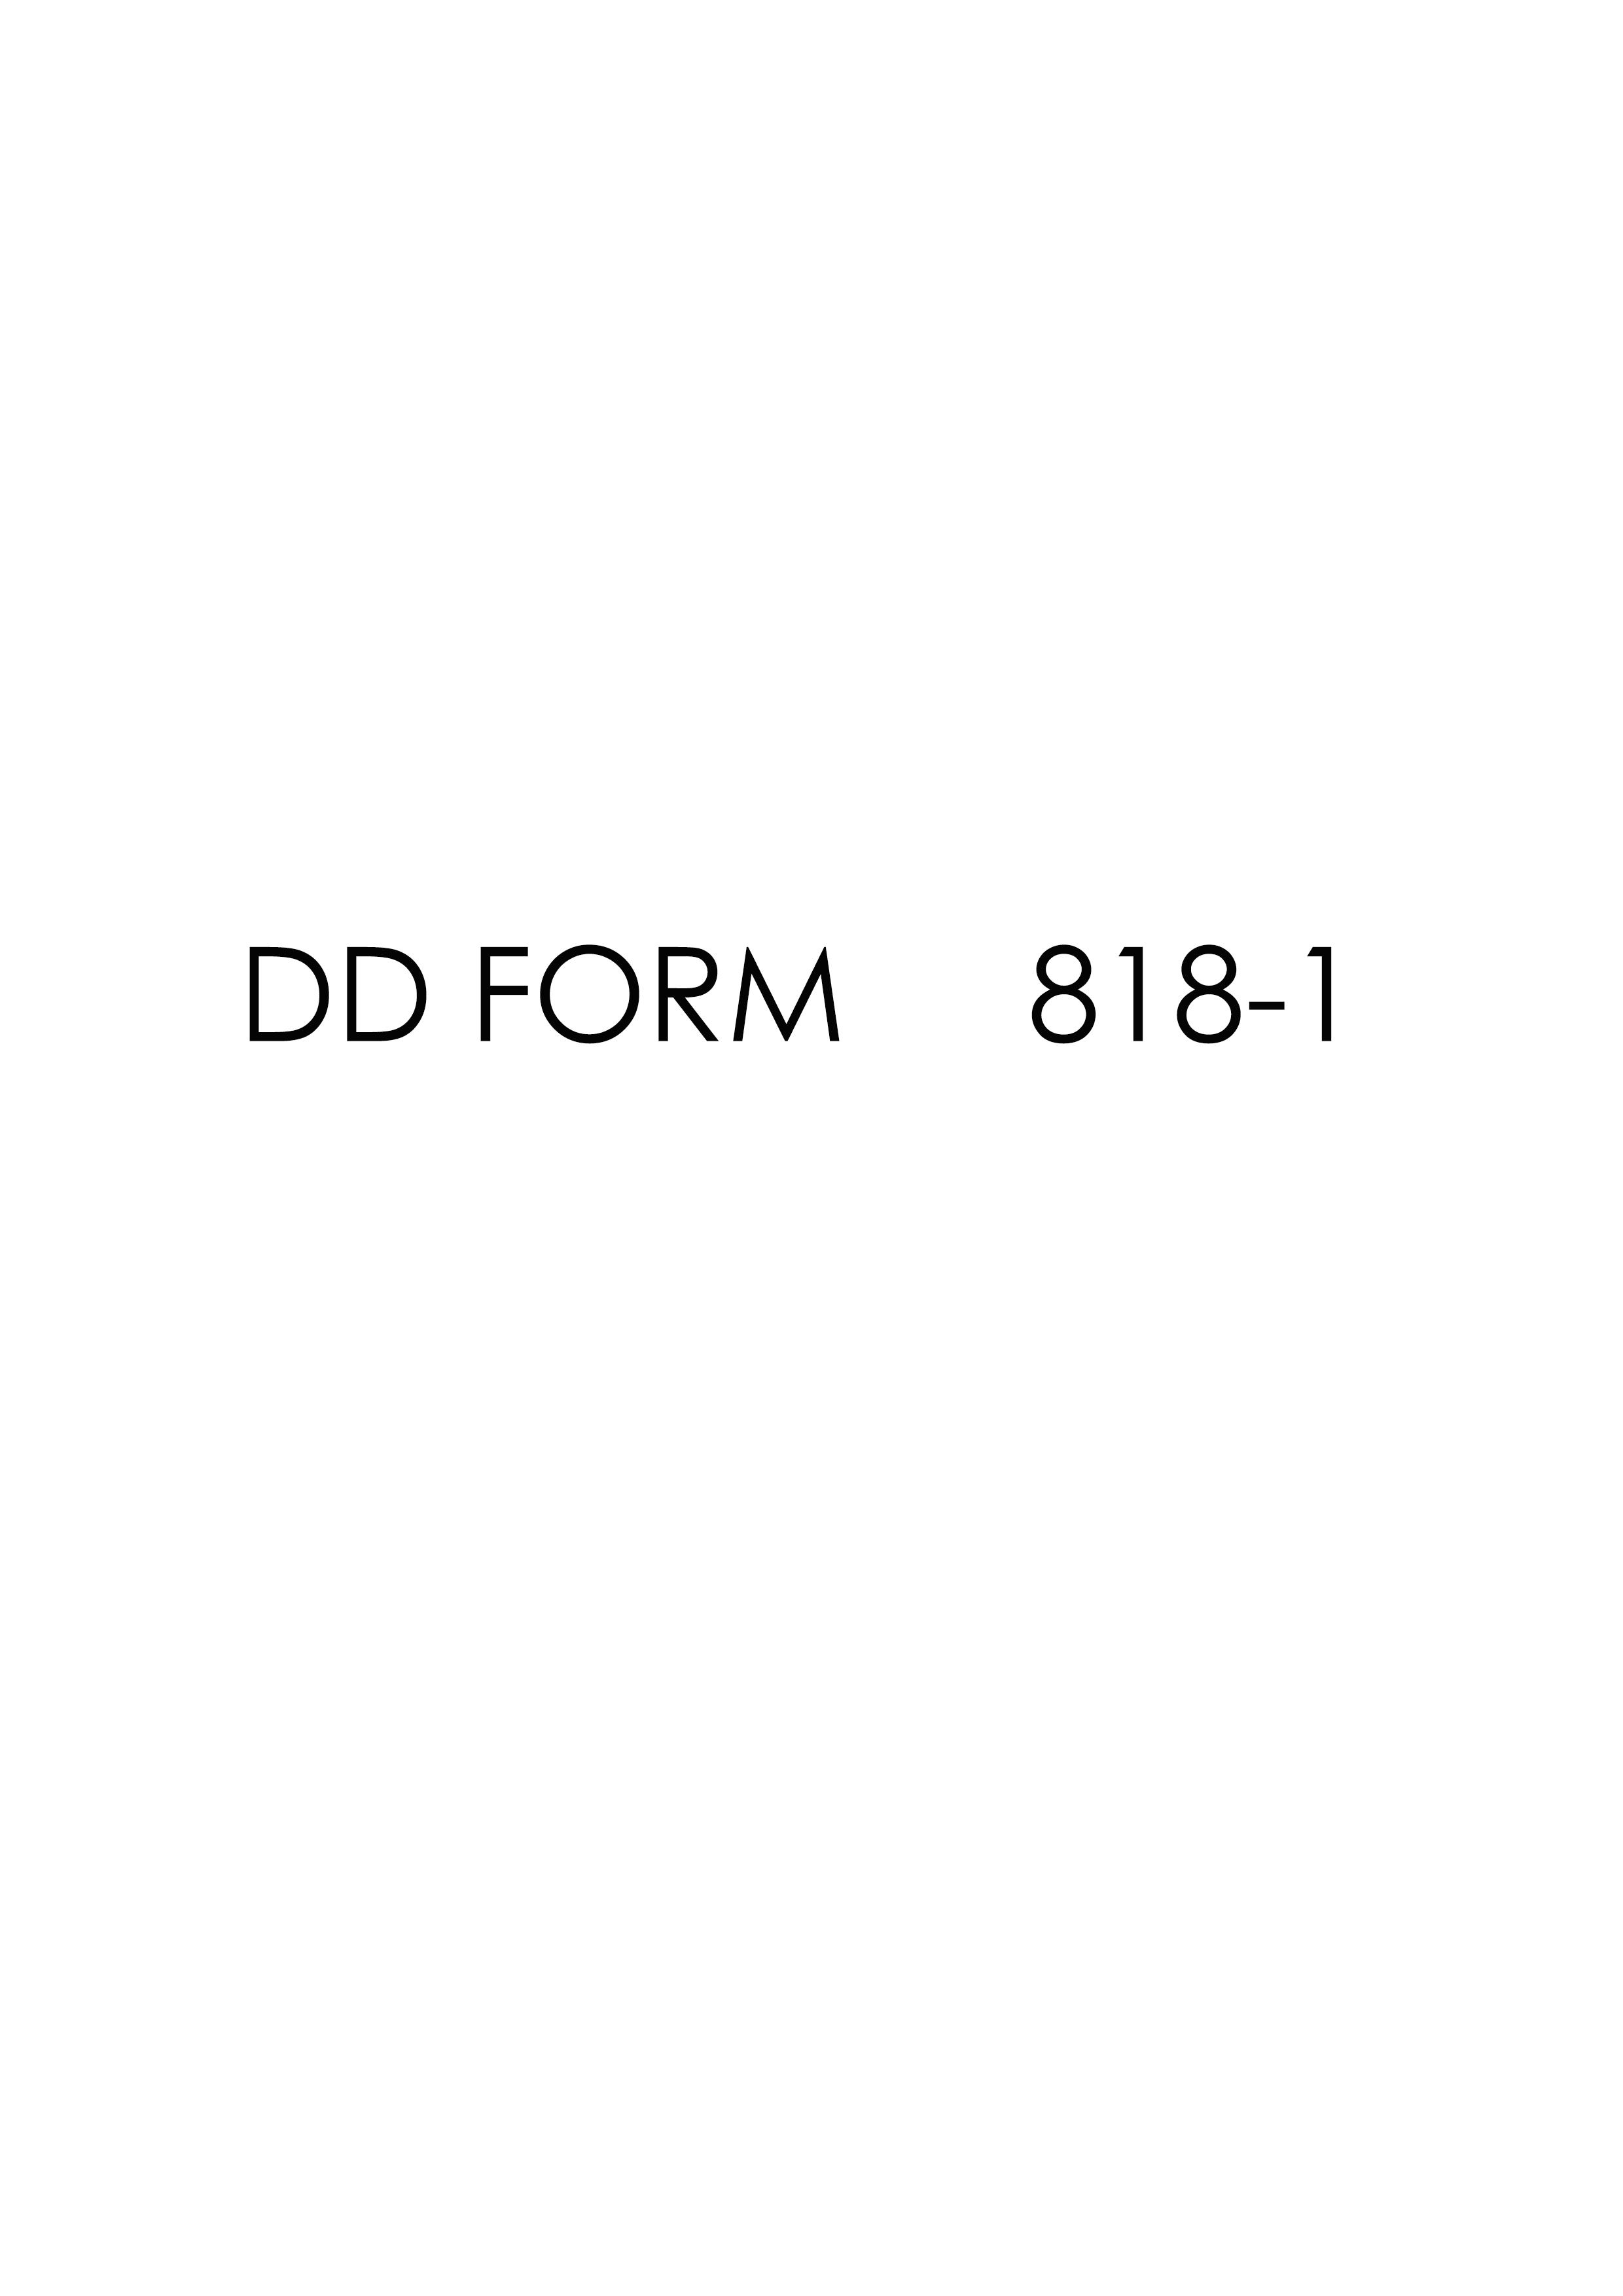 Download dd Form 818-1 Free